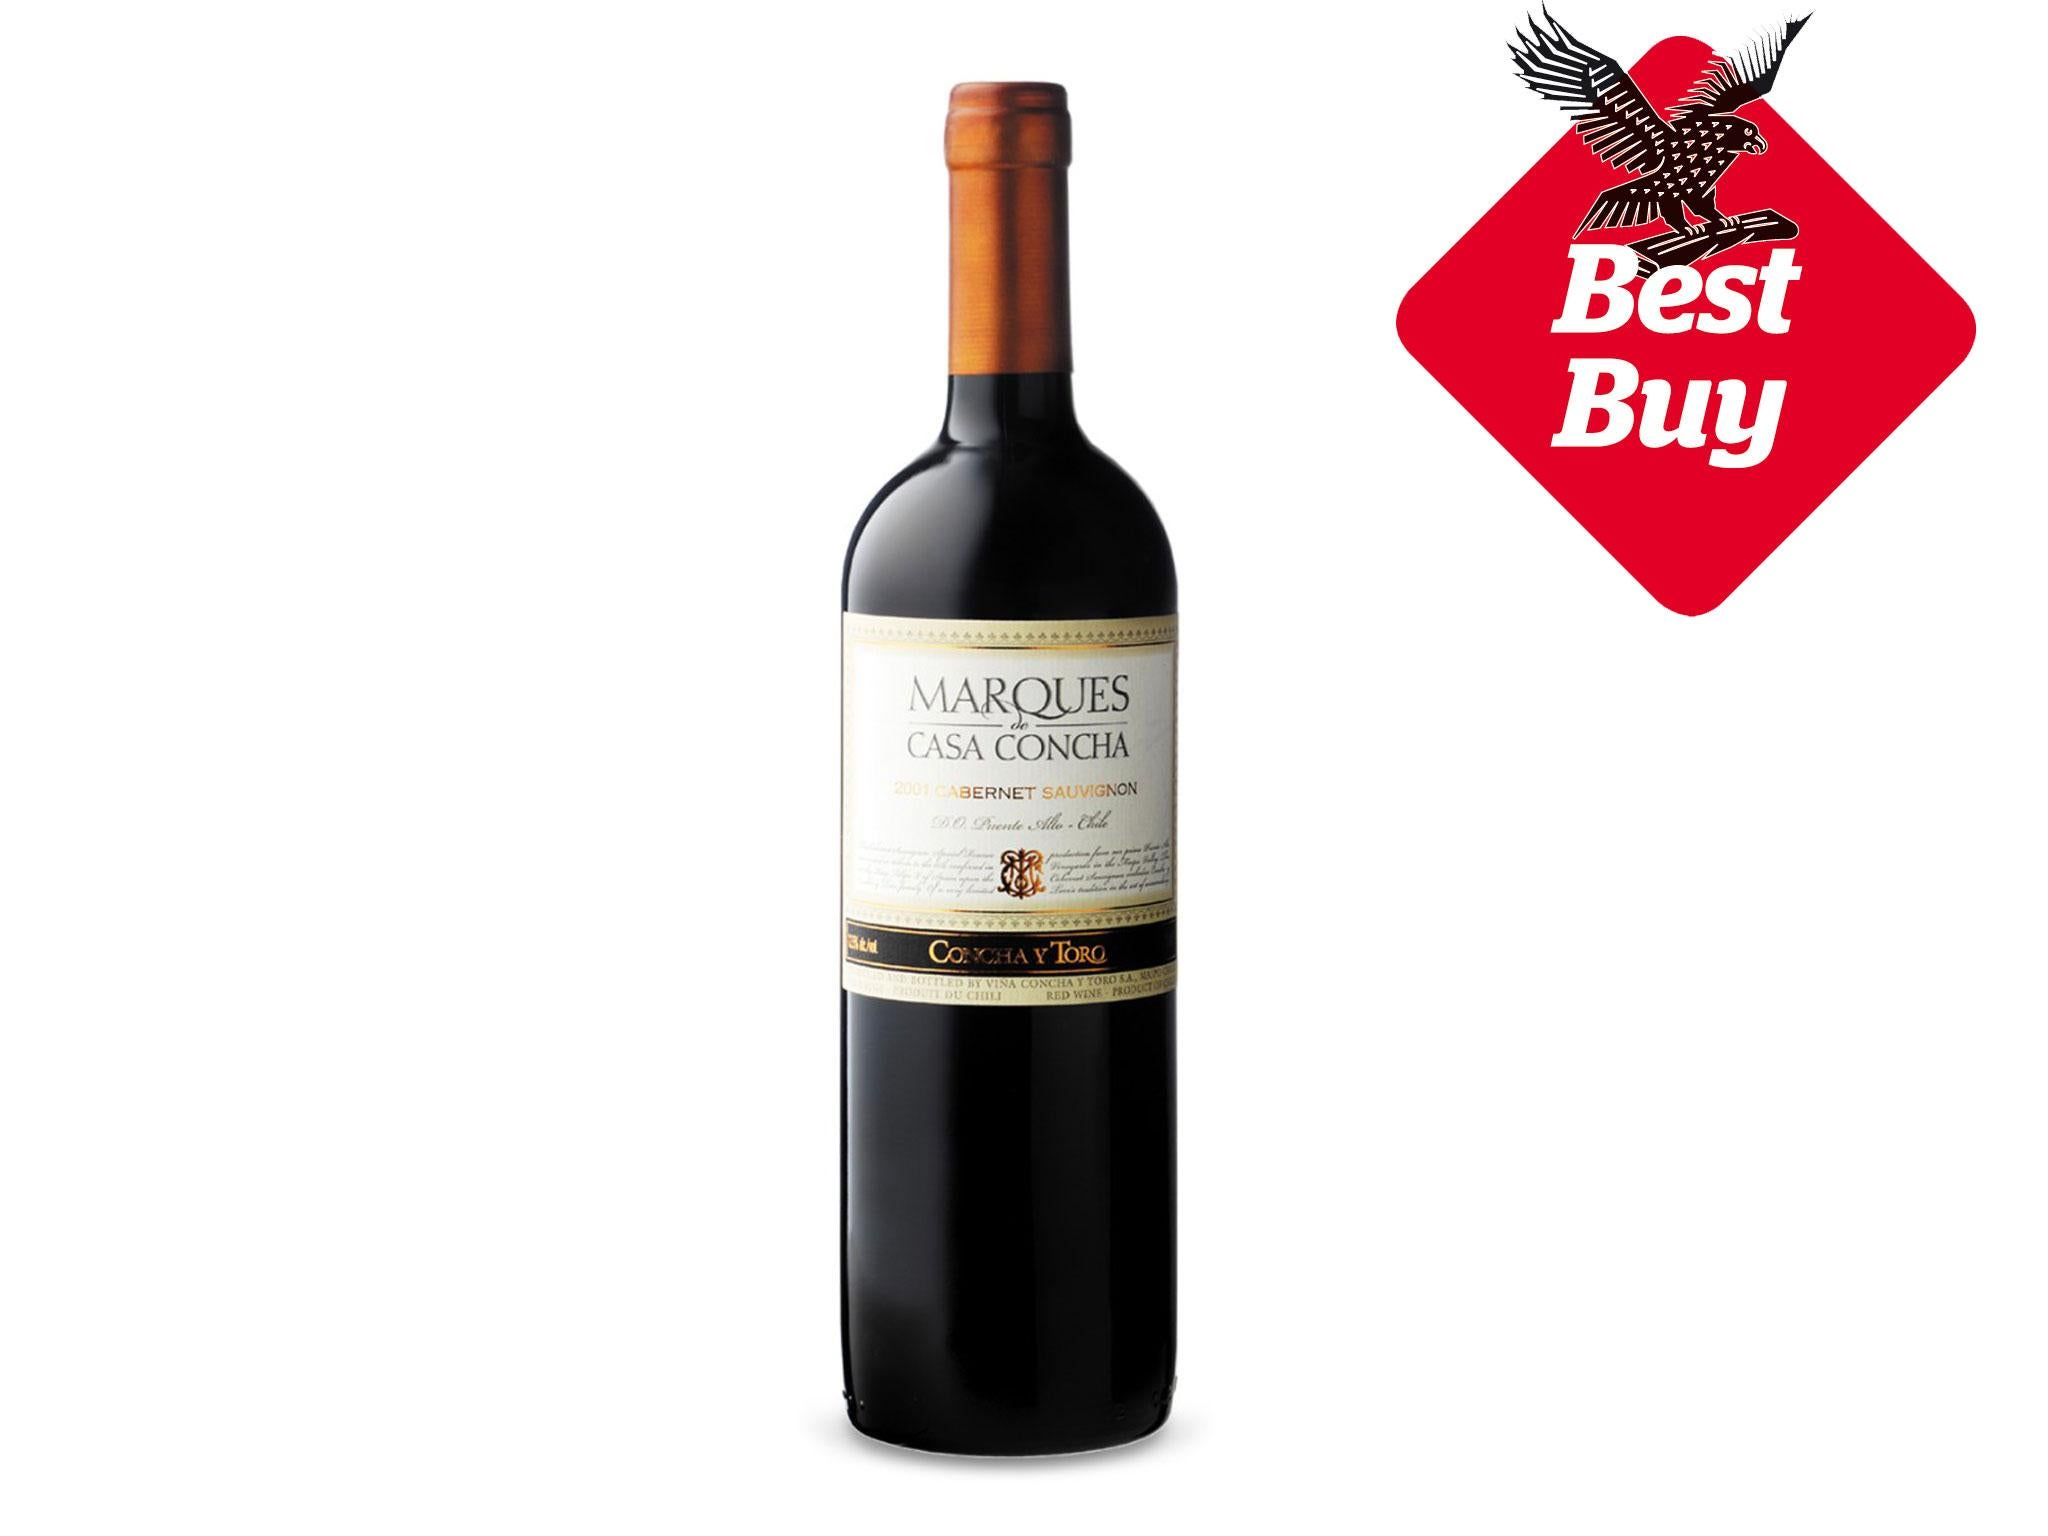 15 best cabernet sauvignons | The Independent